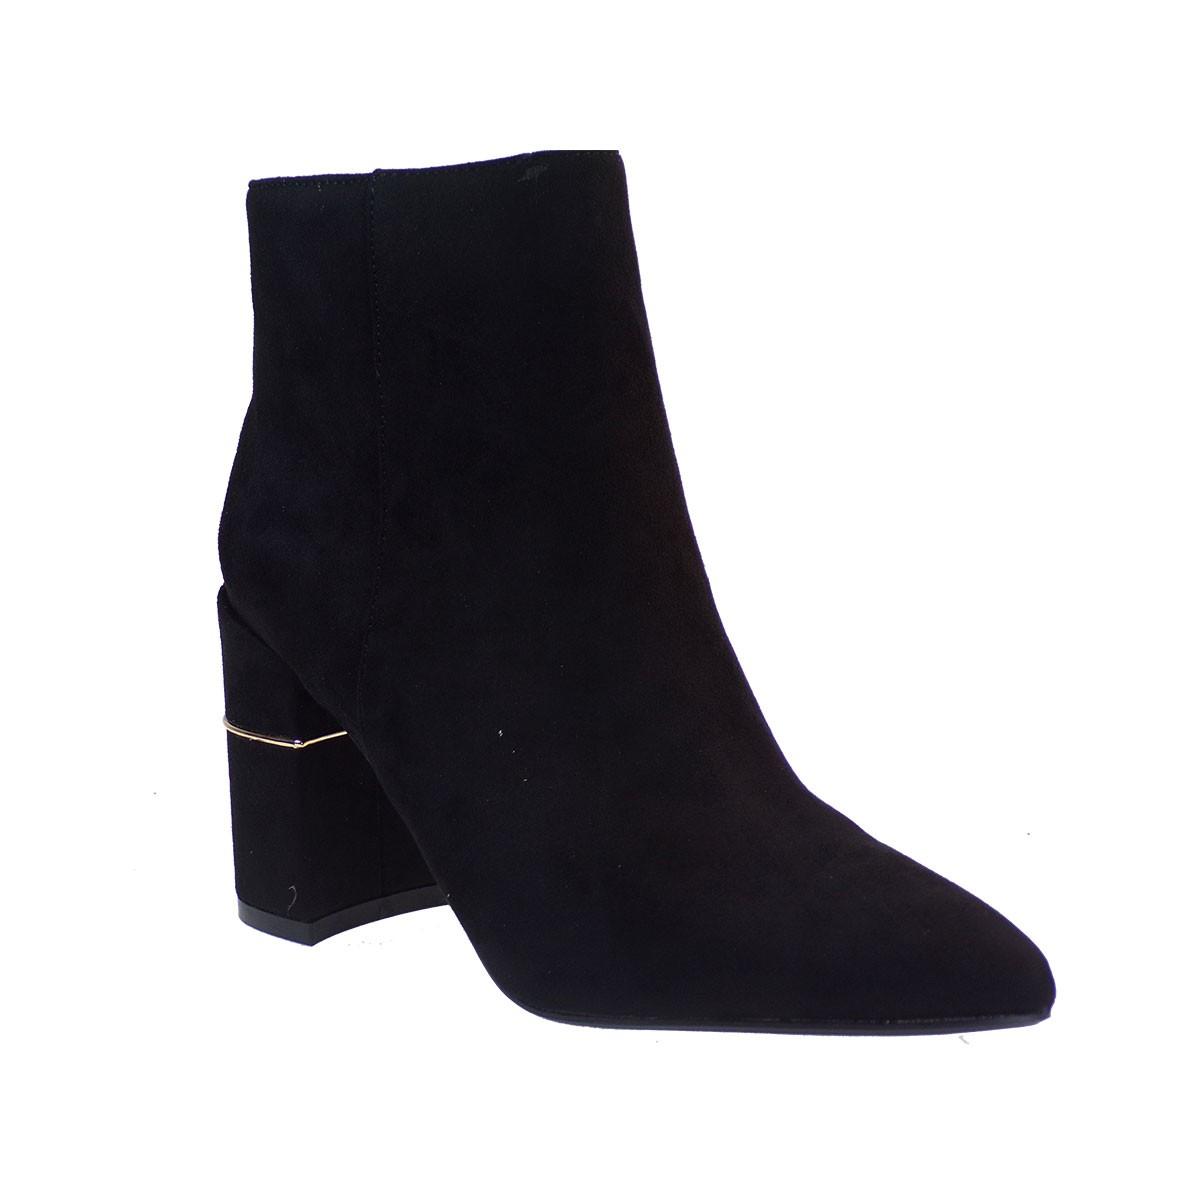 Exe Shoes Γυναικεία Μποτάκια 649-Η1100-Κ649 Μαύρο J3695649500405